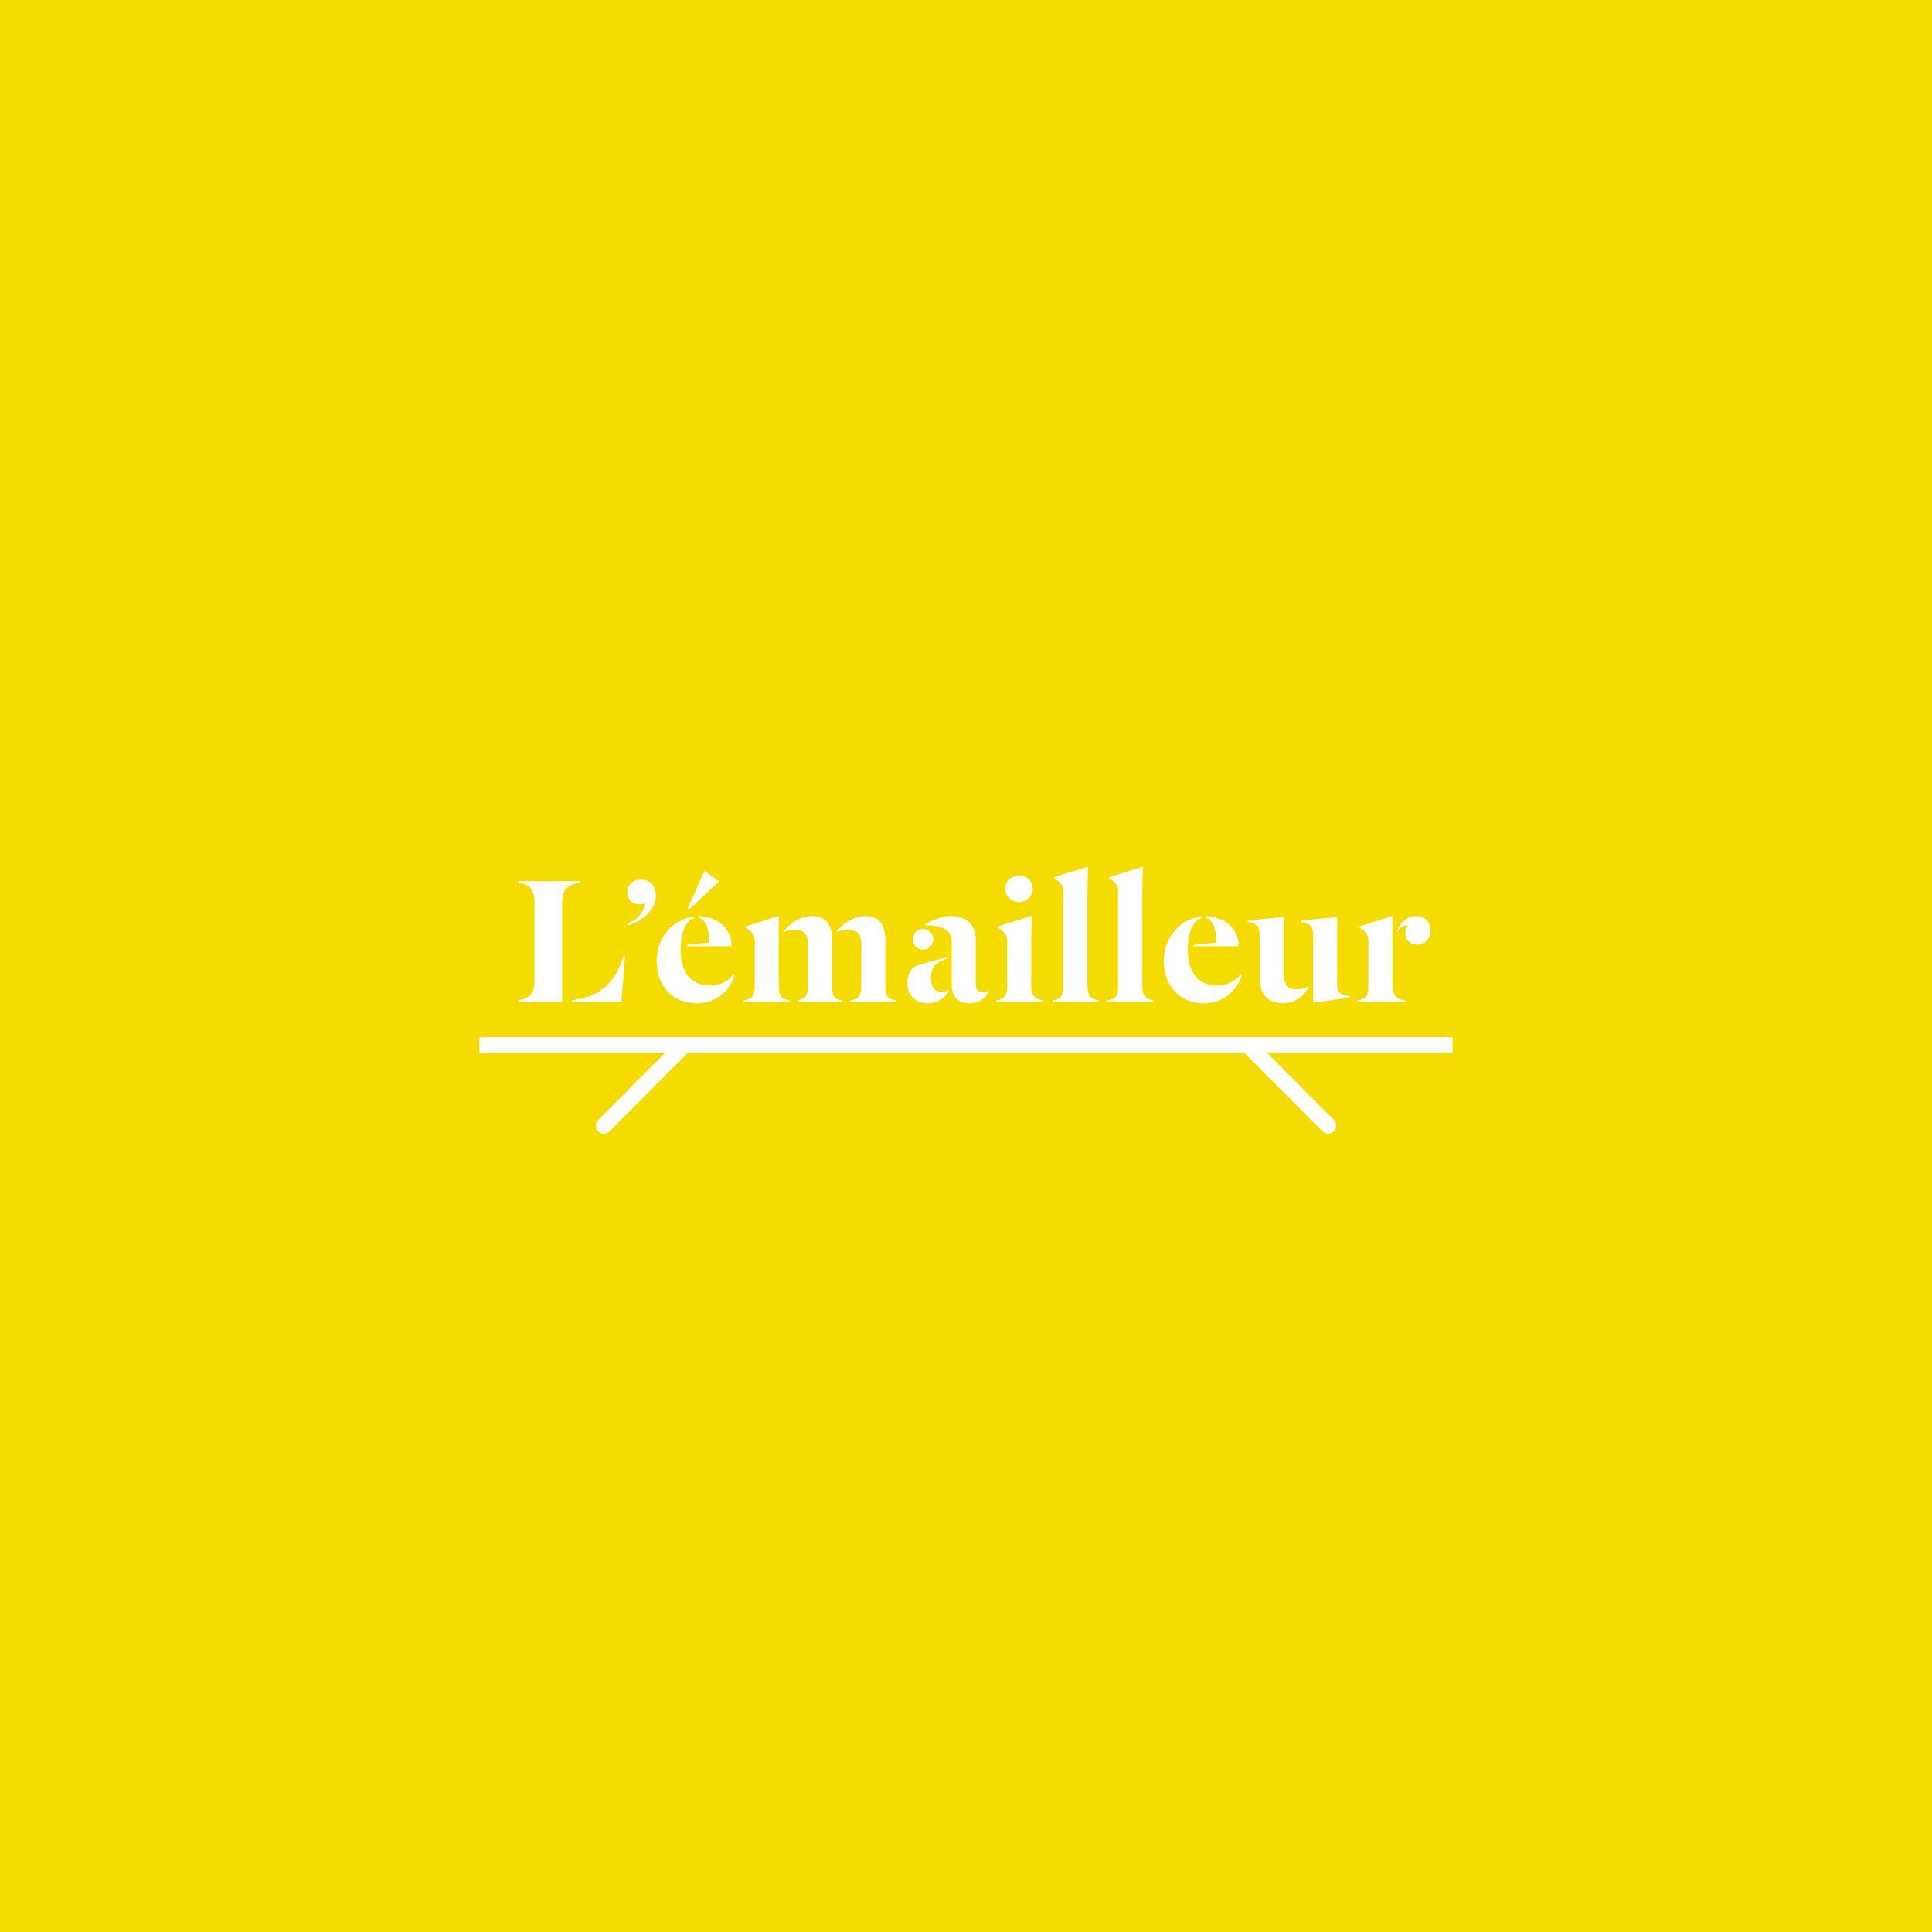 logo_emailleur_141.jpg